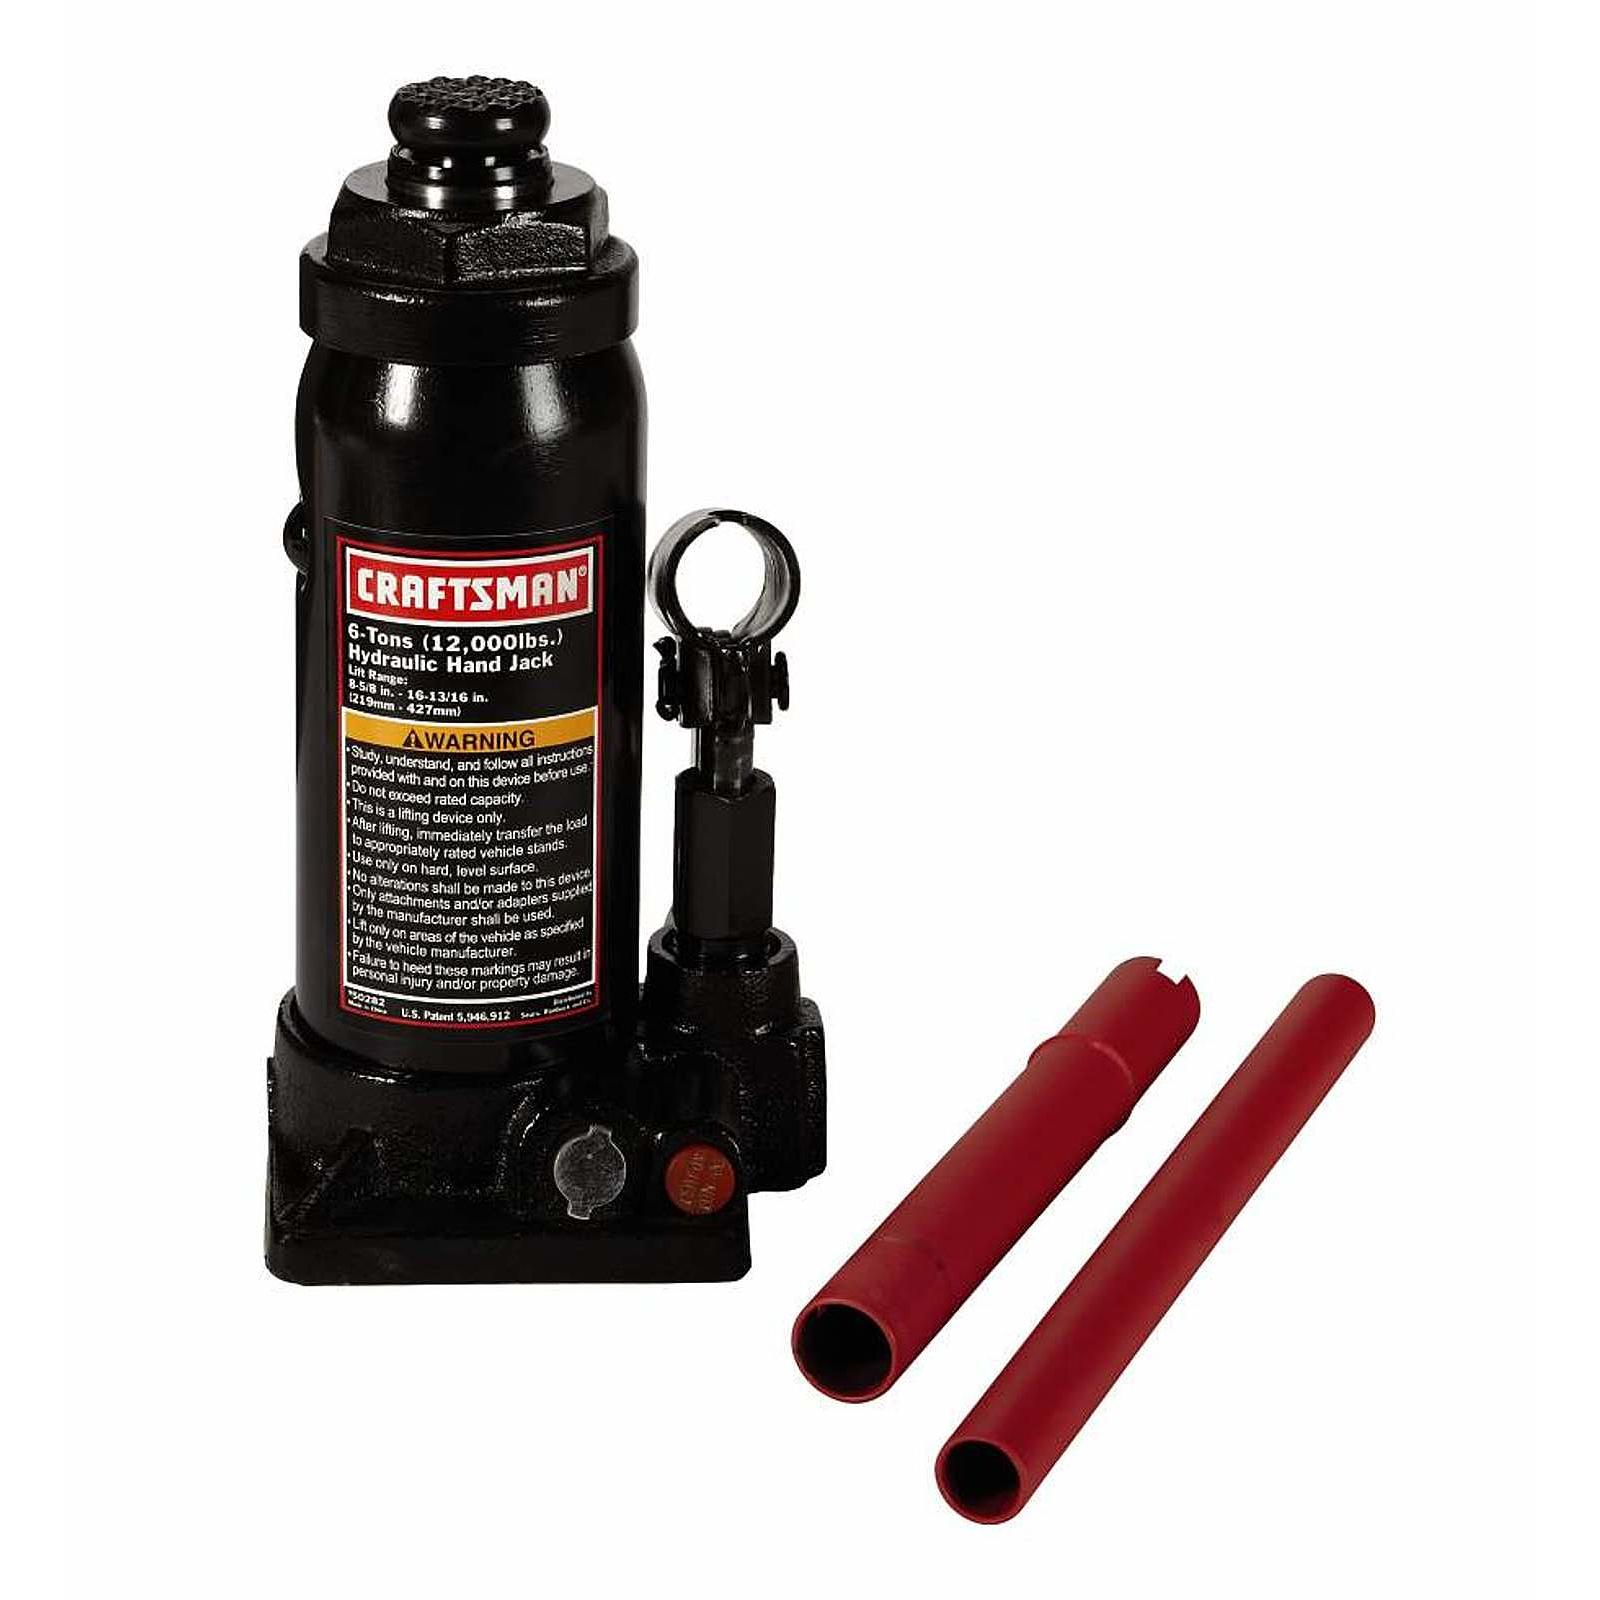 Craftsman 6-Ton Hydraulic Bottle Jack $12.09 + Free Store Pickup ~ Sears